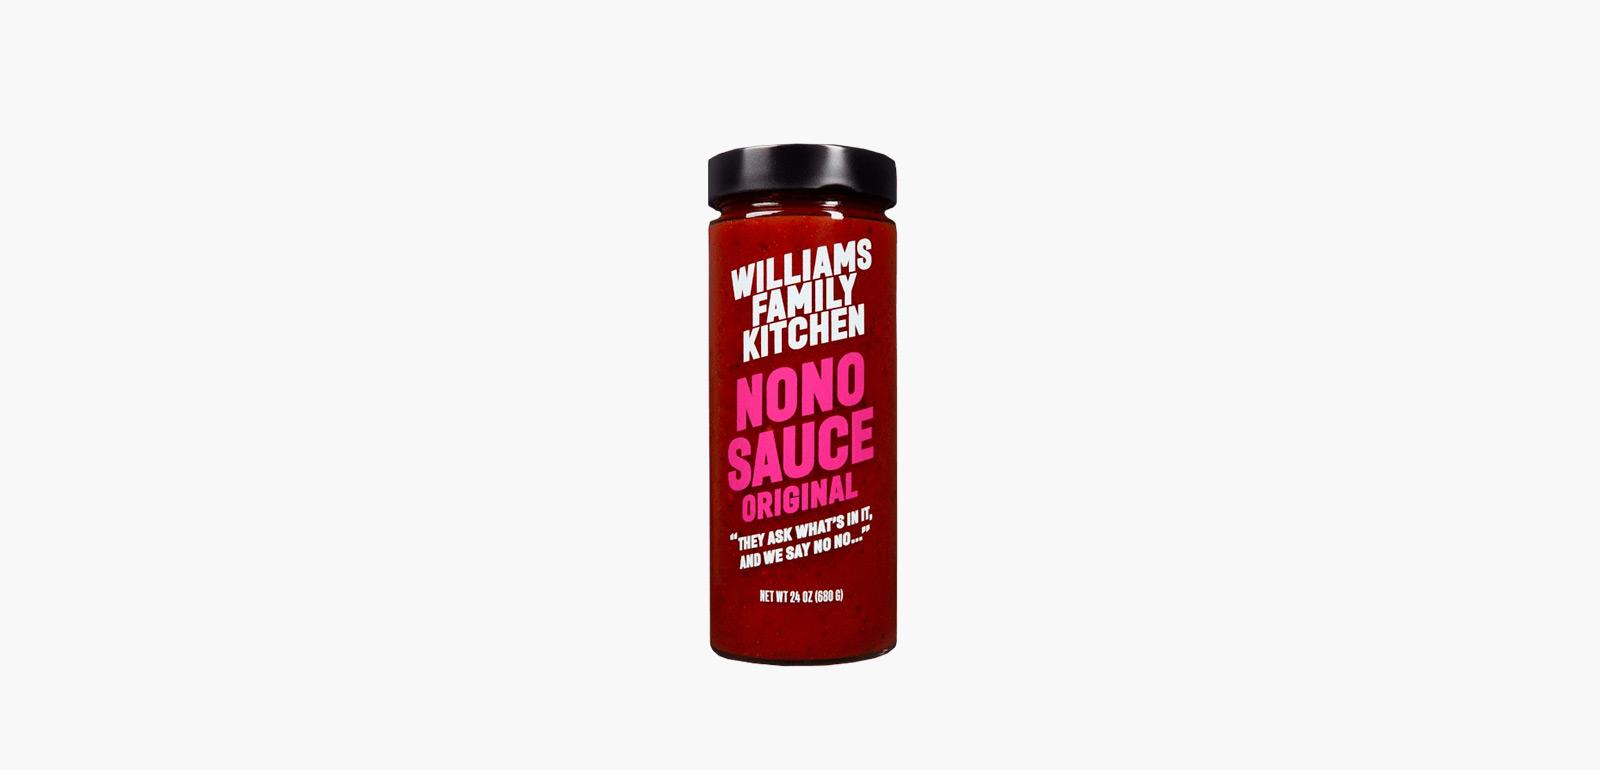 Williams Family Kitchen Nono Sauce